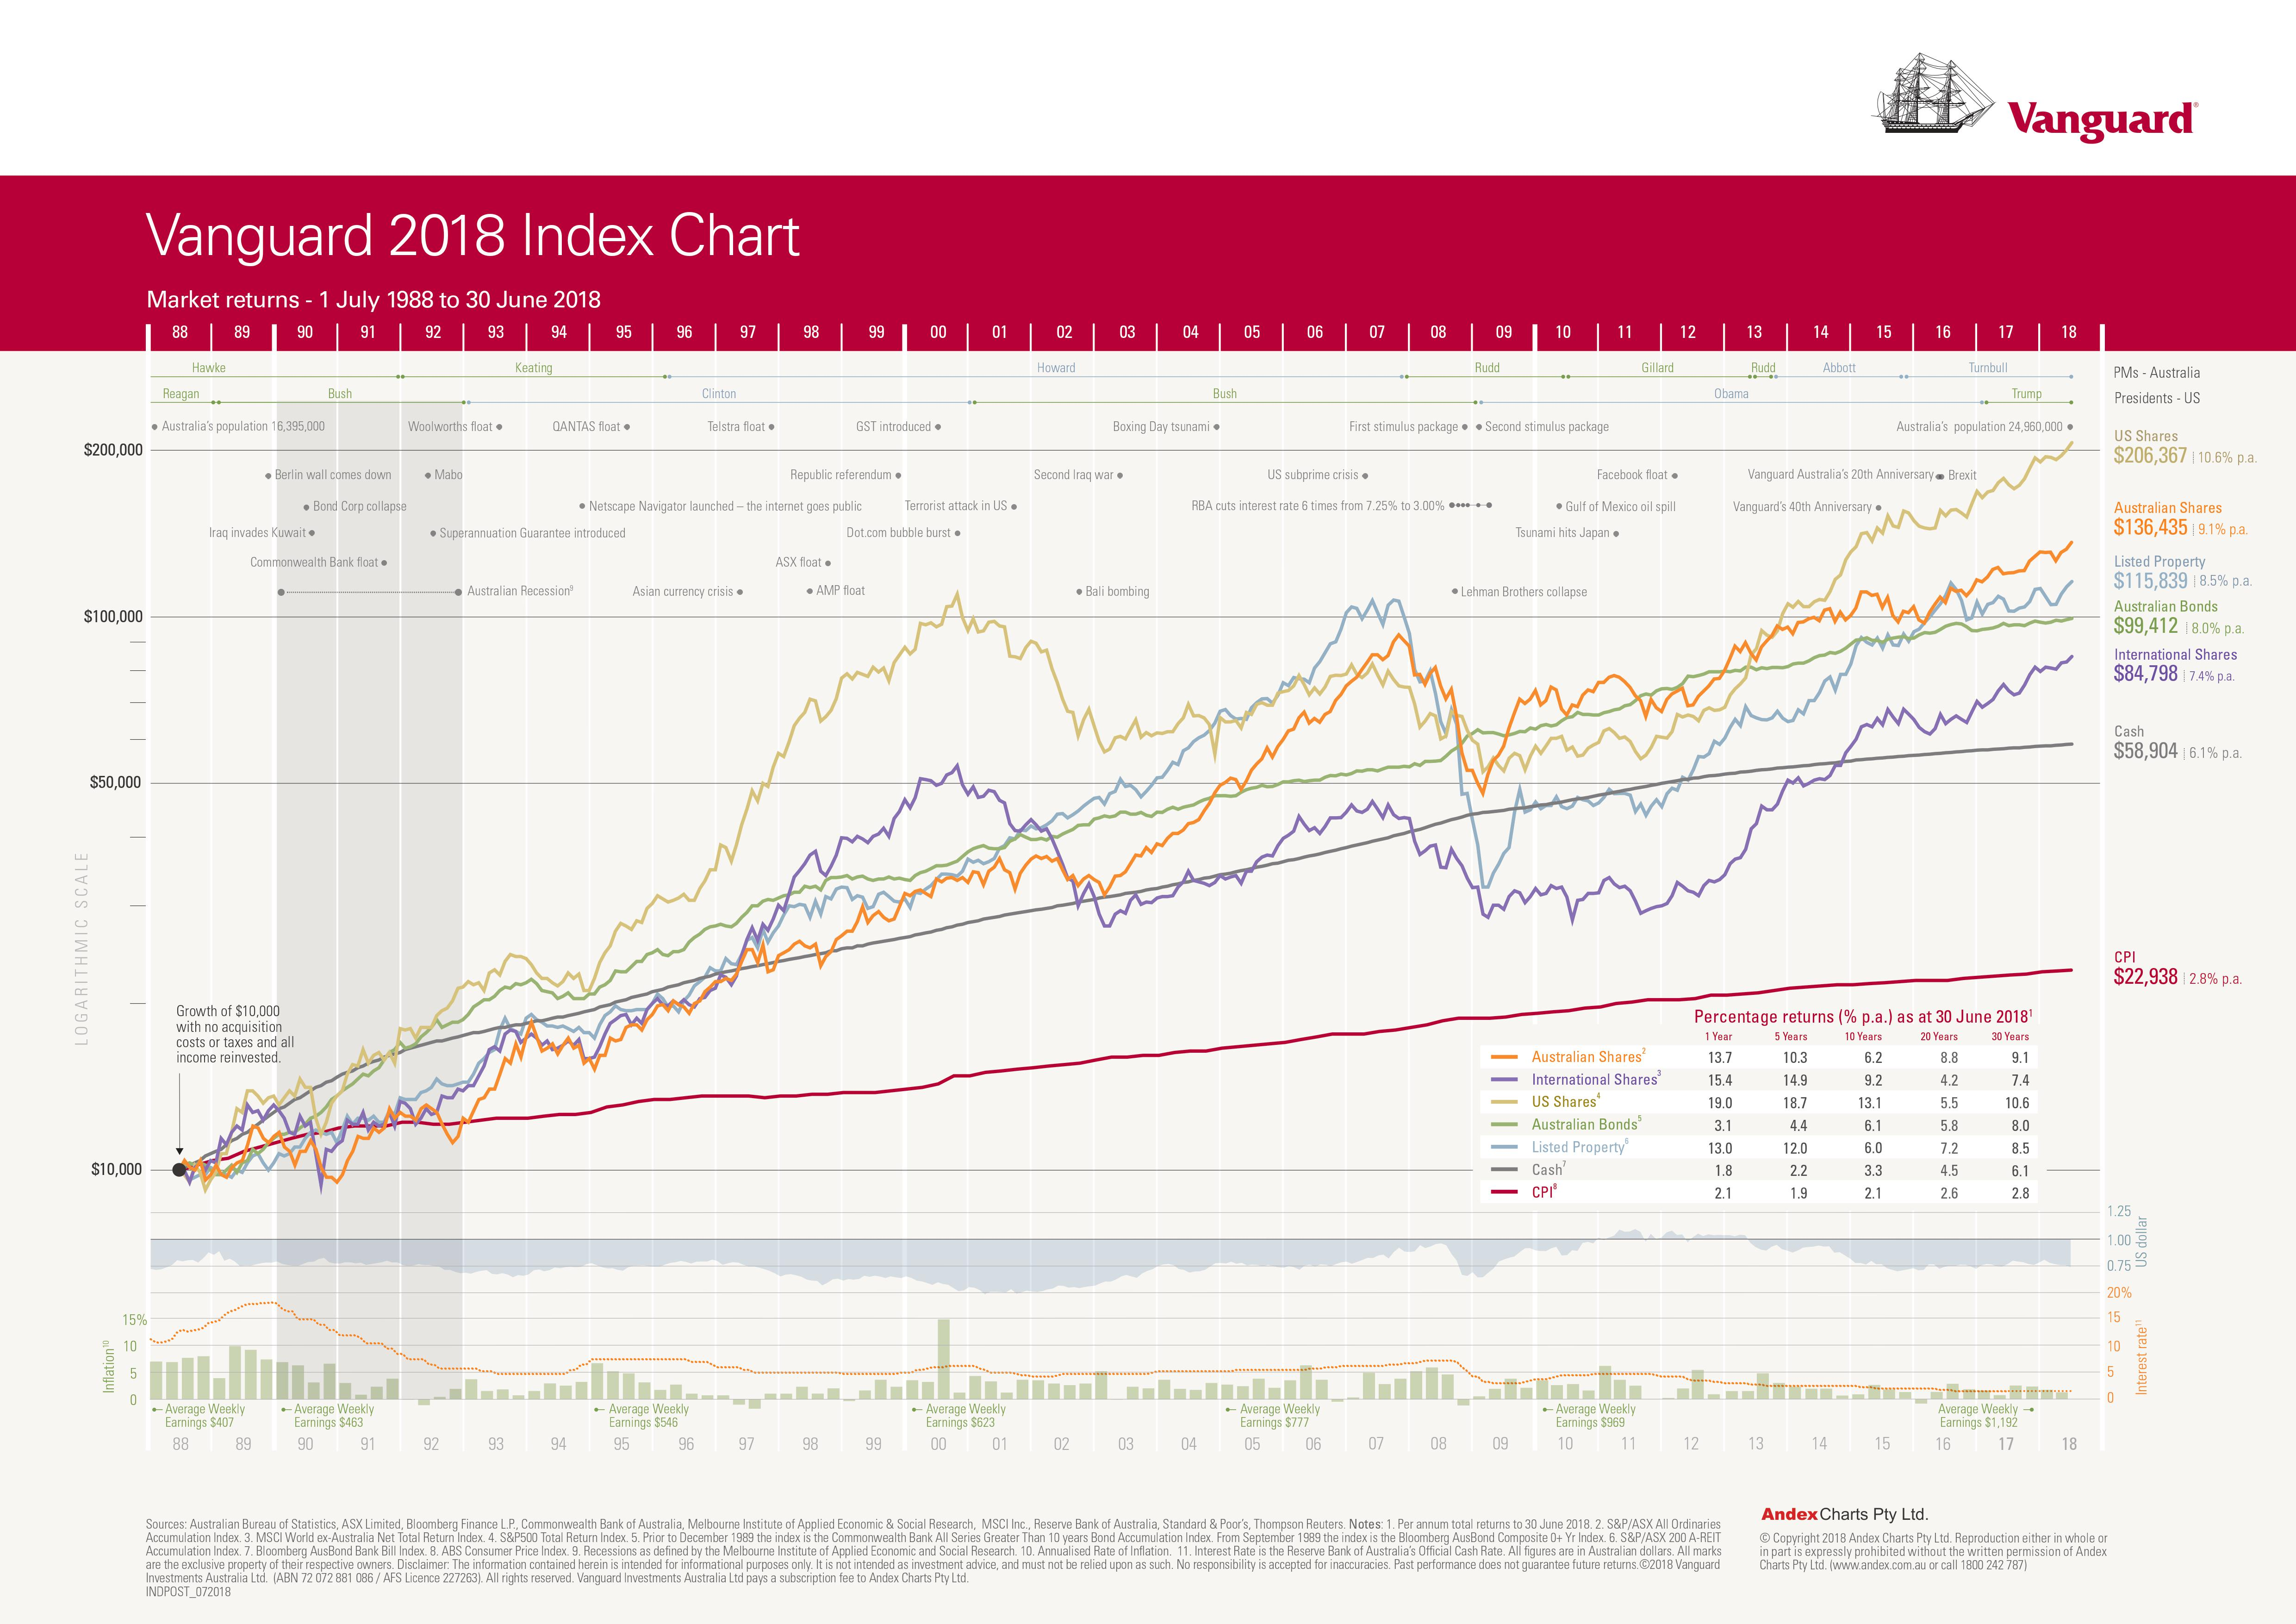 Vanguard 2018 Index Chart